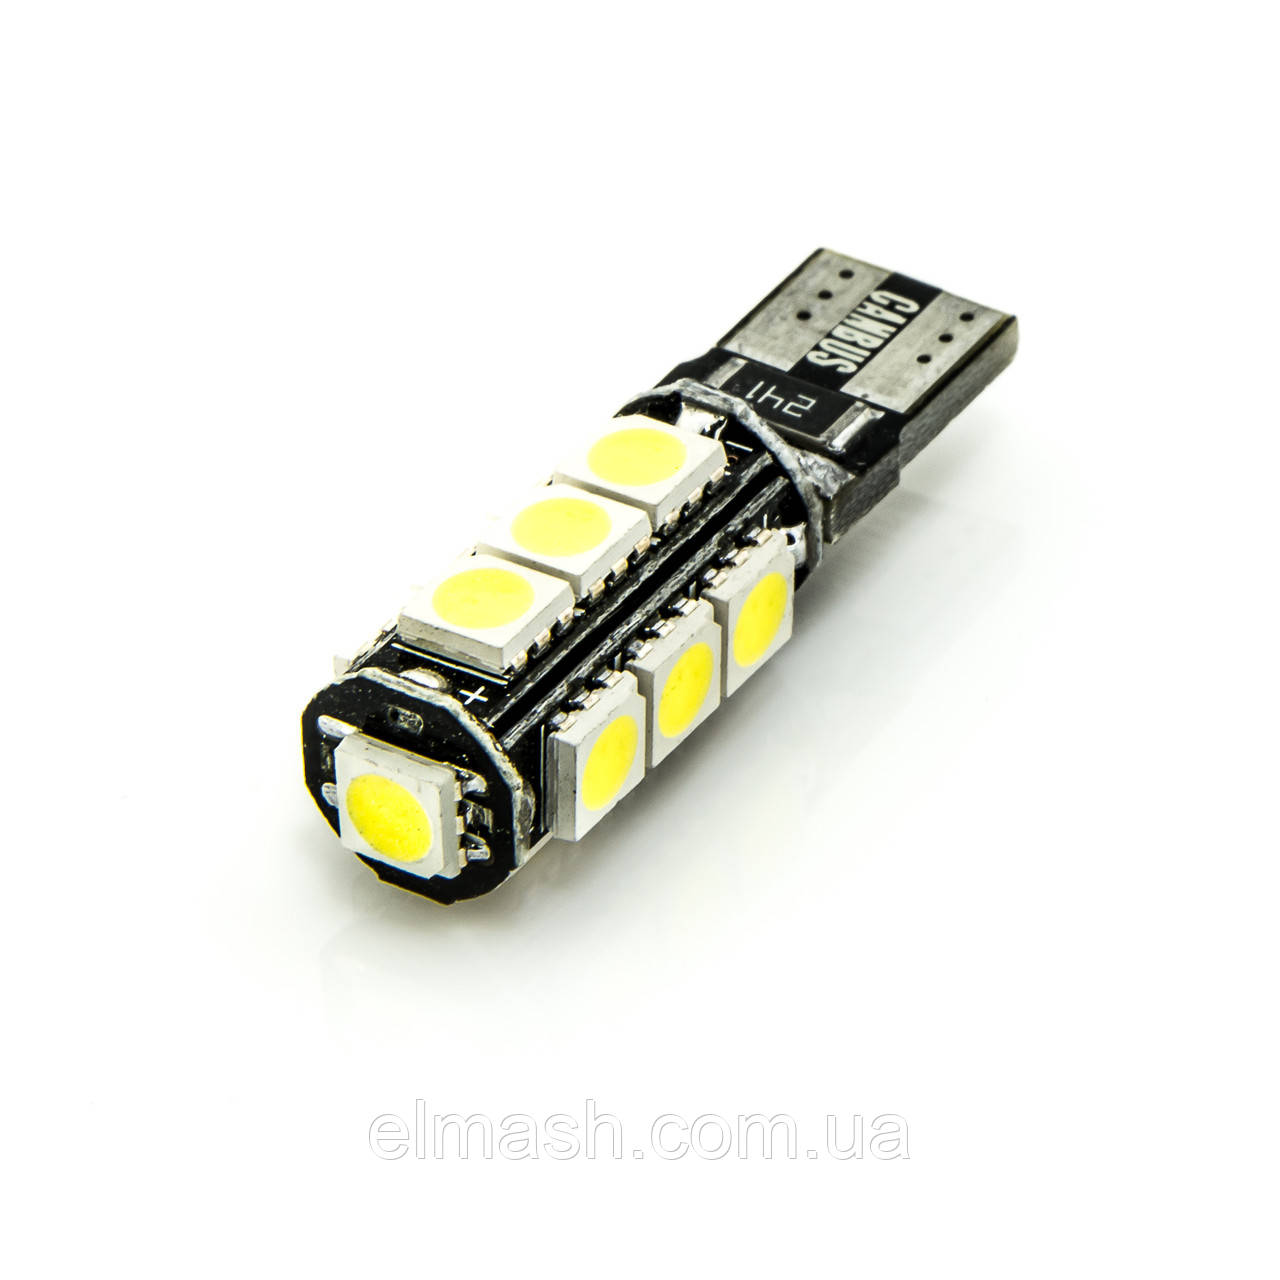 Лампа LED 12V T10 (W5W) 13SMD 5050 обманка 195Lm БЕЛЫЙ